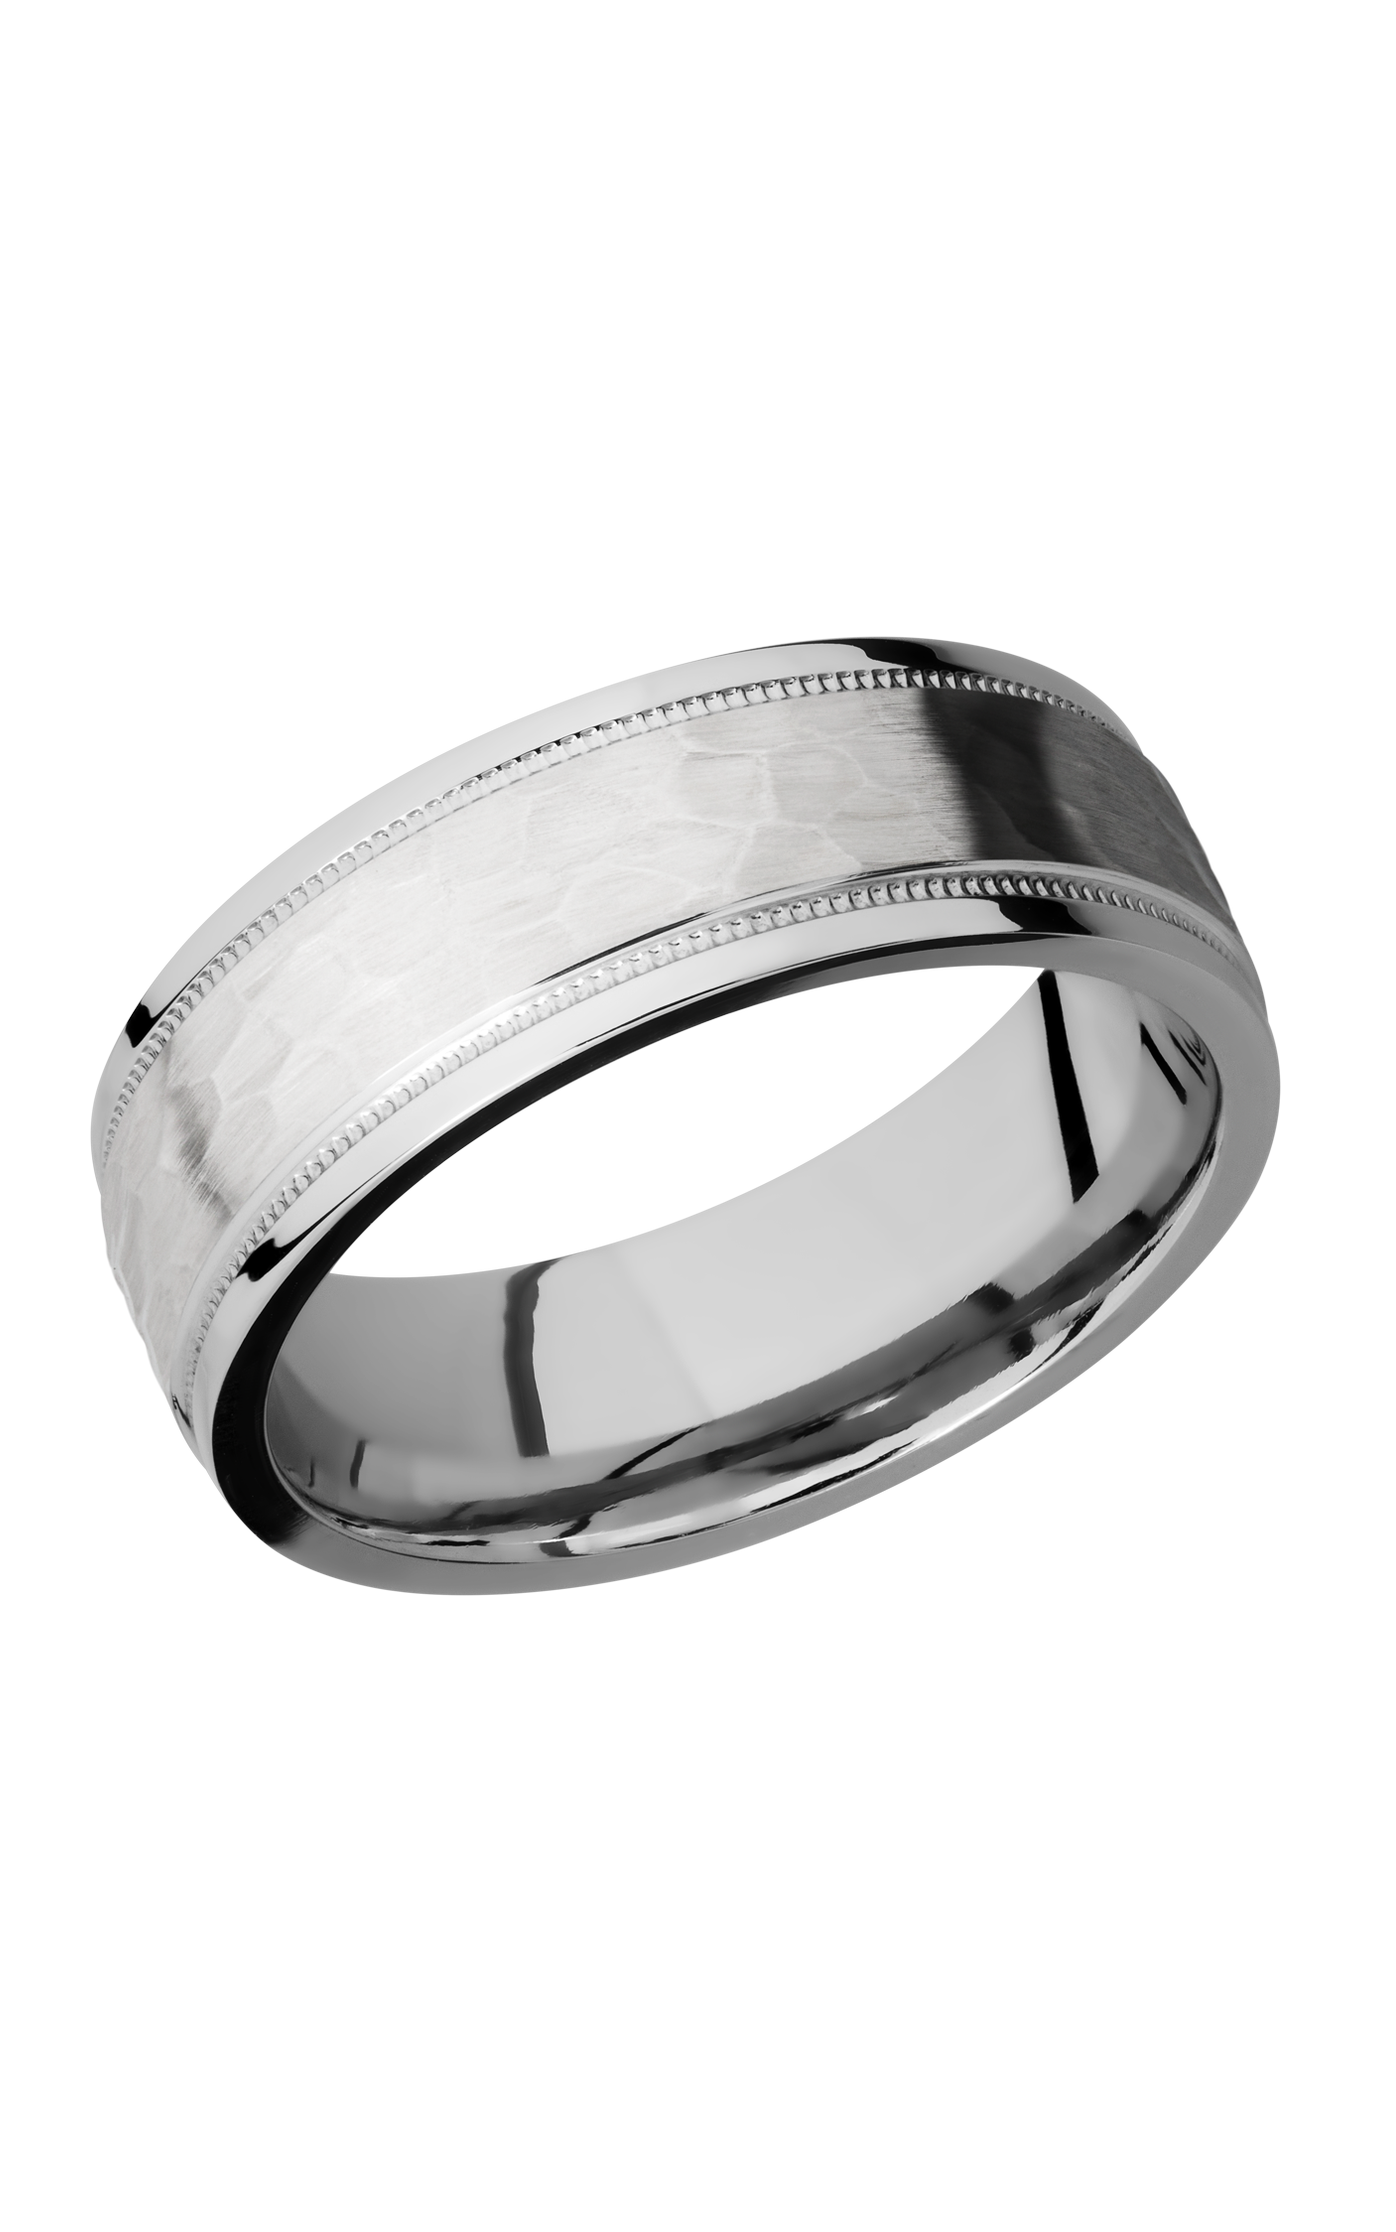 Lashbrook Precious Metals 14KW7.5FGEW2UMIL product image